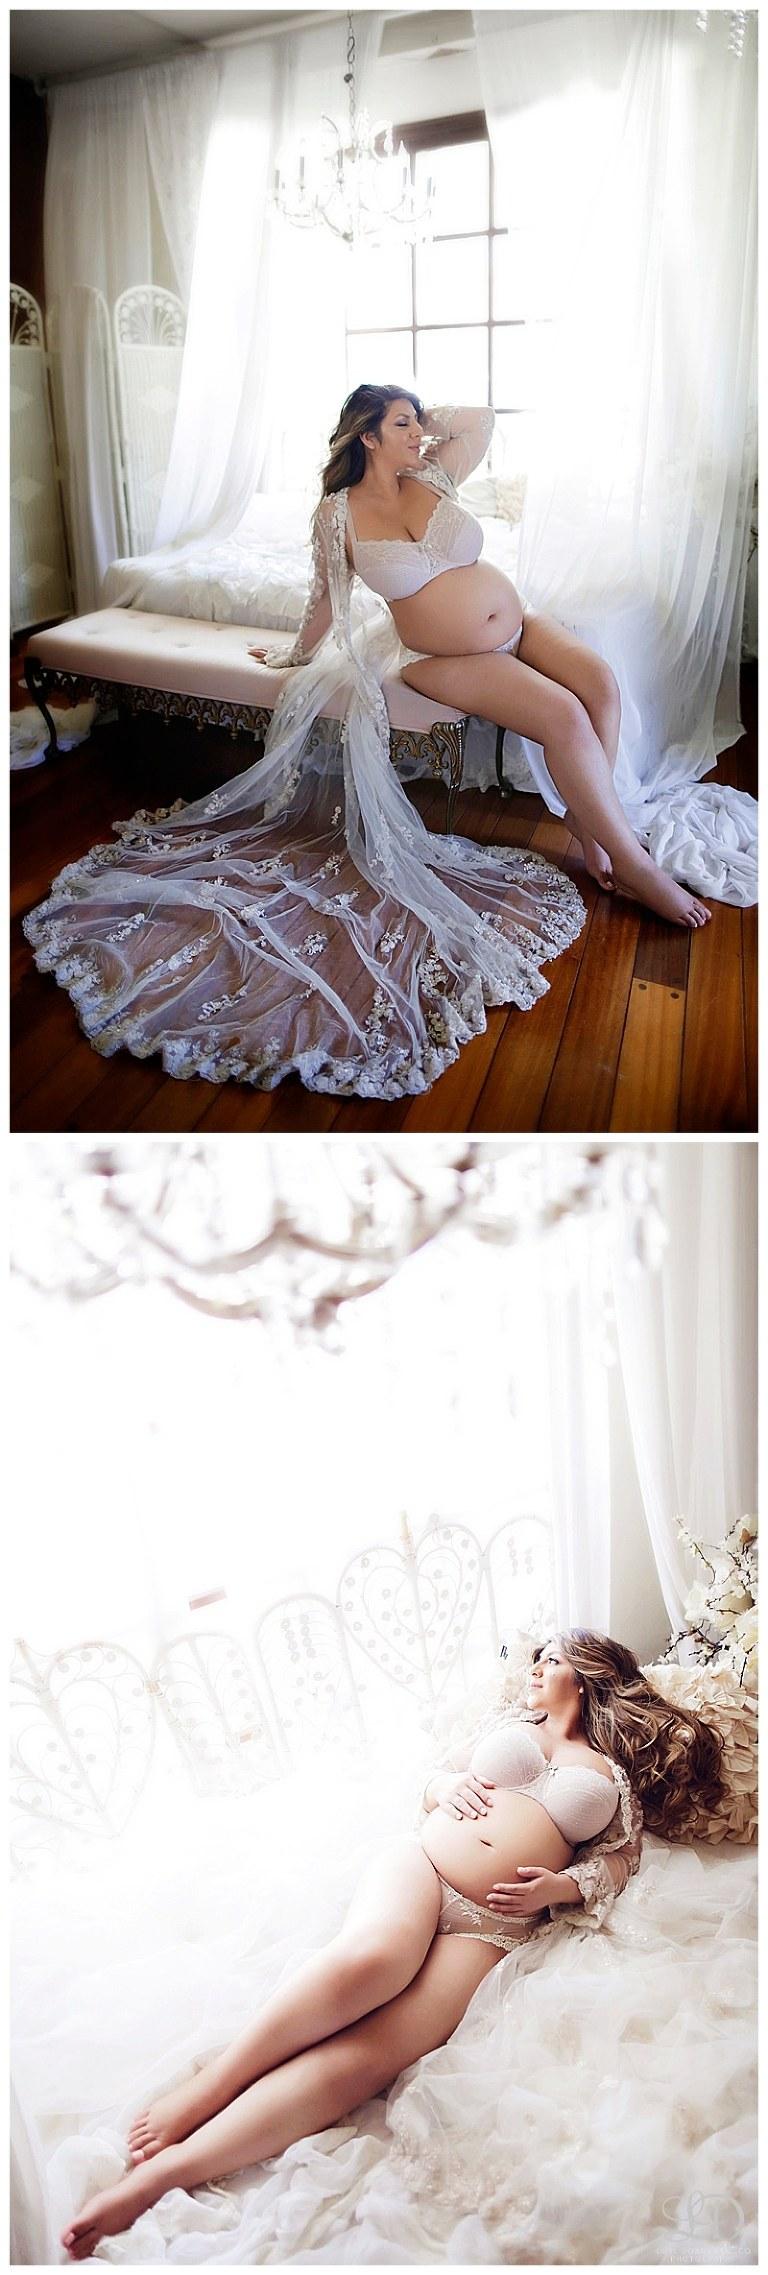 sweet maternity photoshoot-lori dorman photography-maternity boudoir-professional photographer_5300.jpg